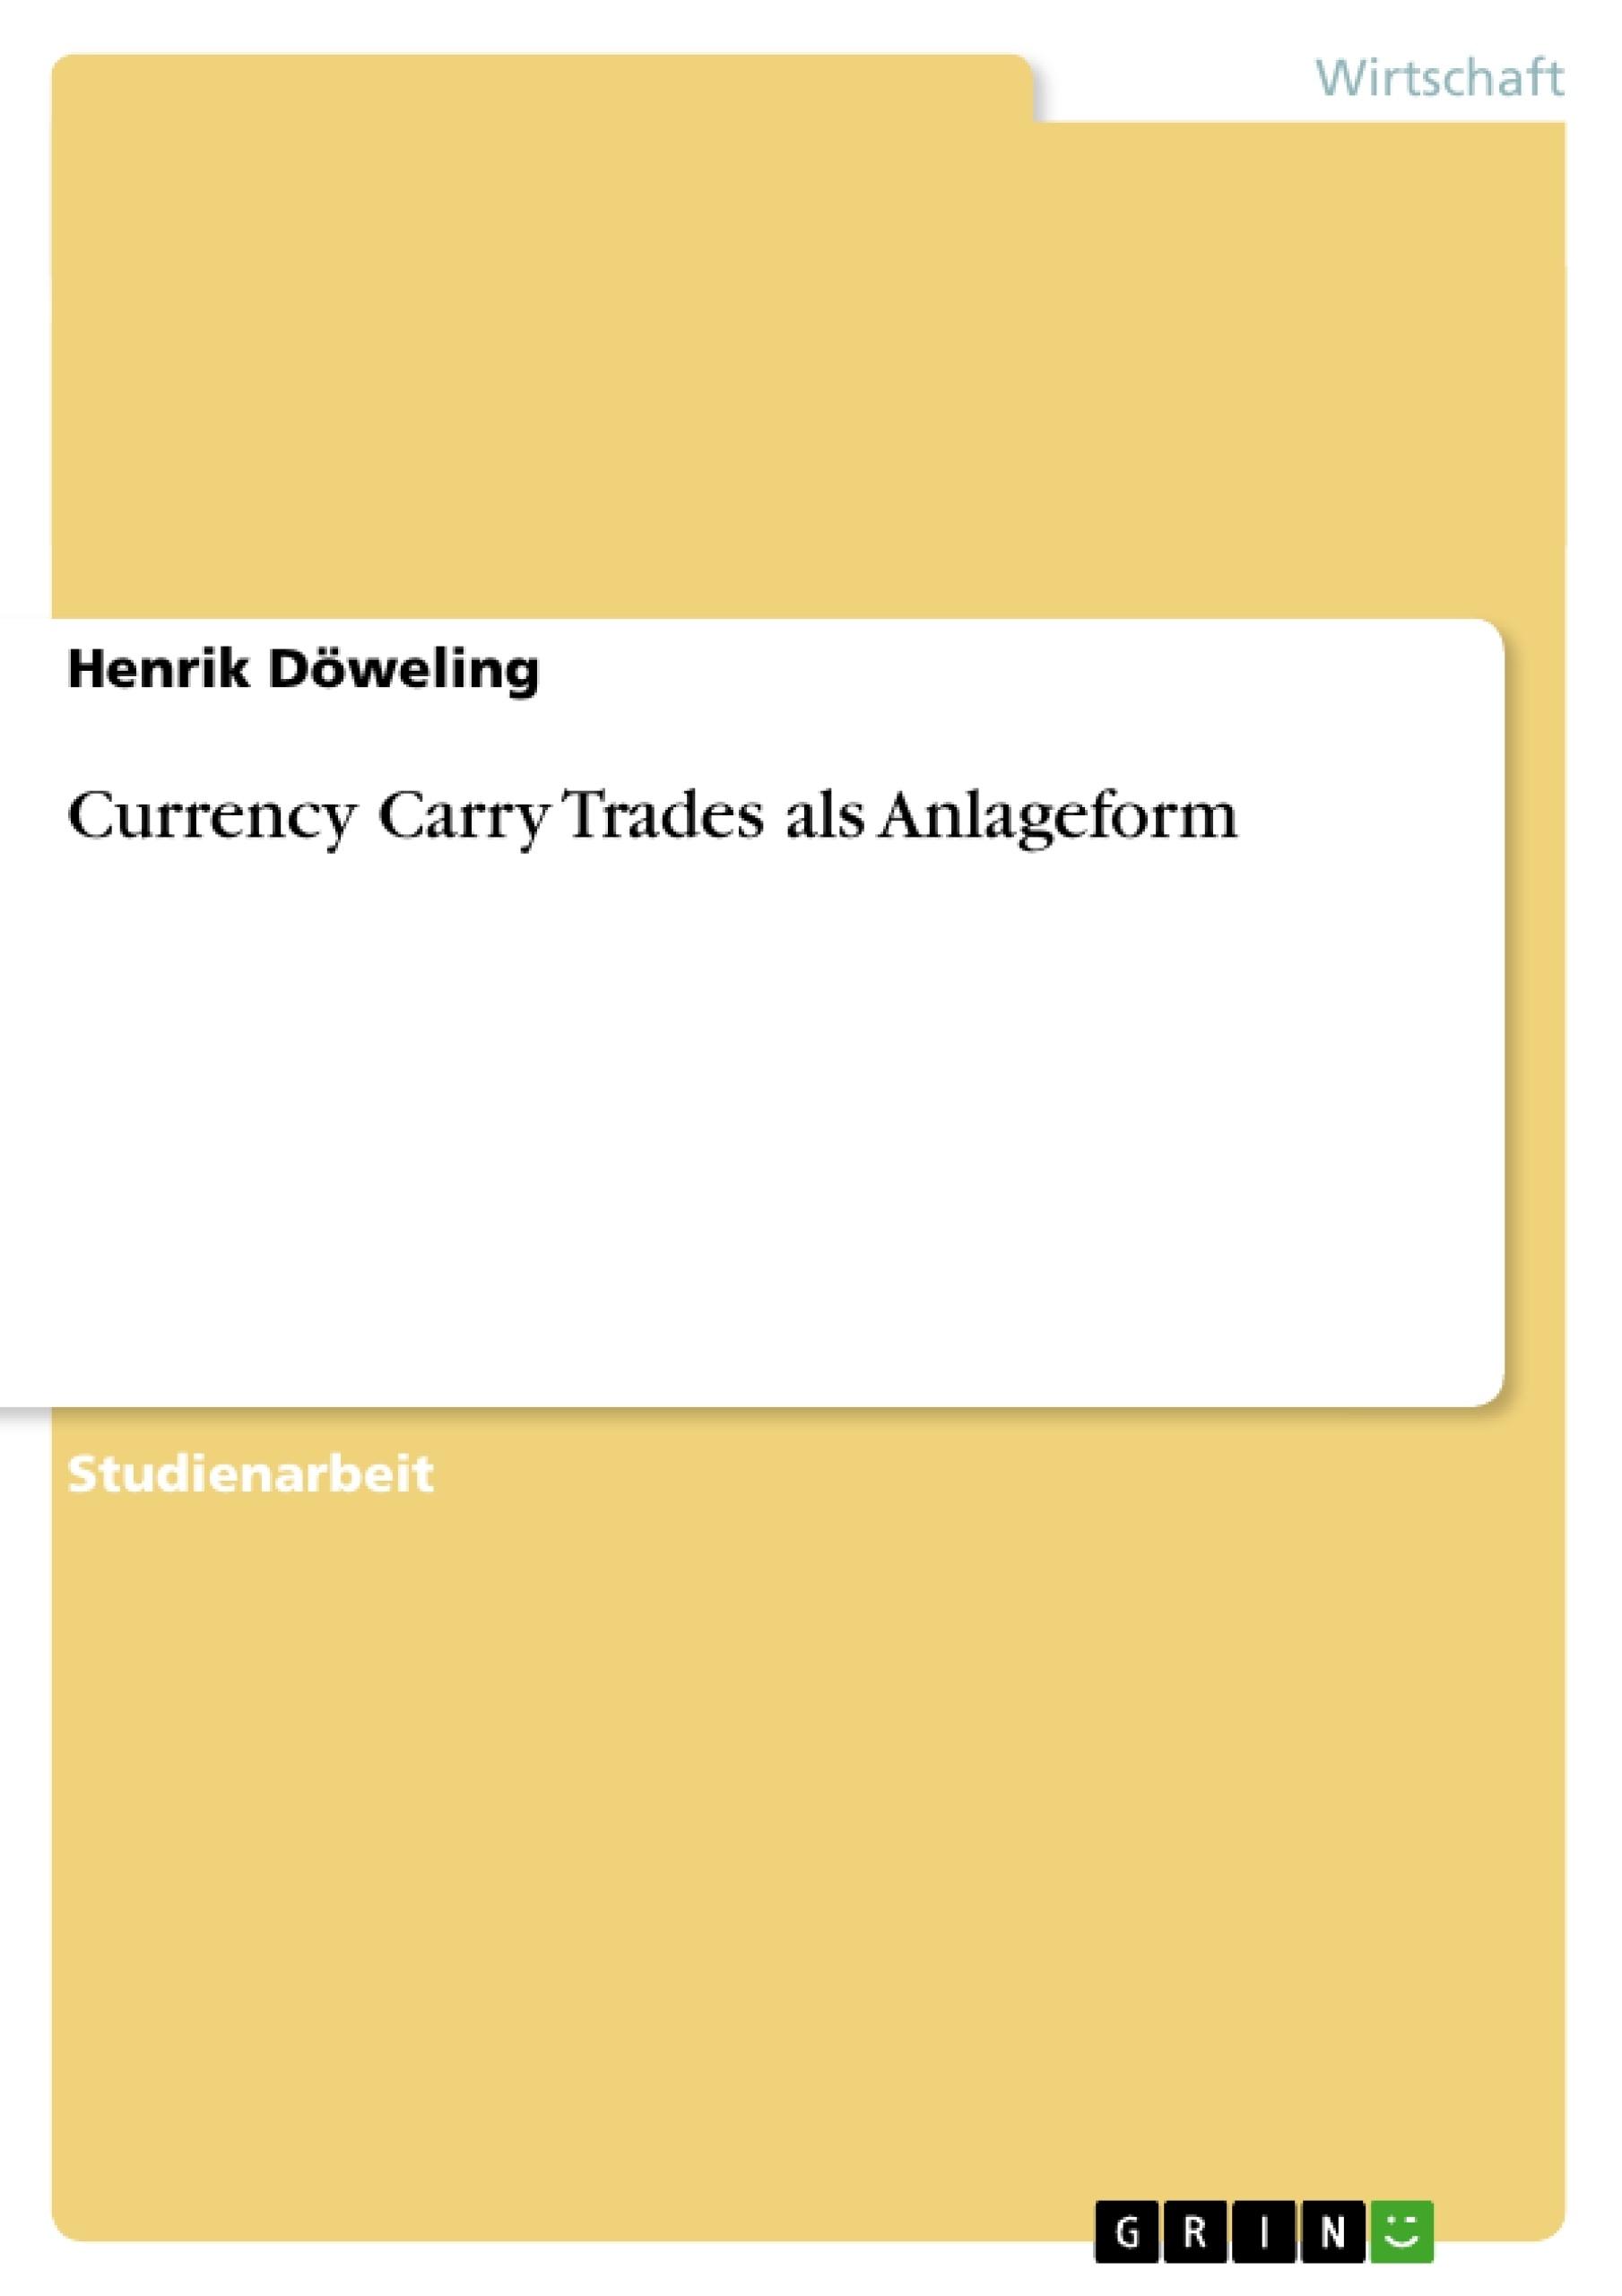 Titel: Currency Carry Trades als Anlageform